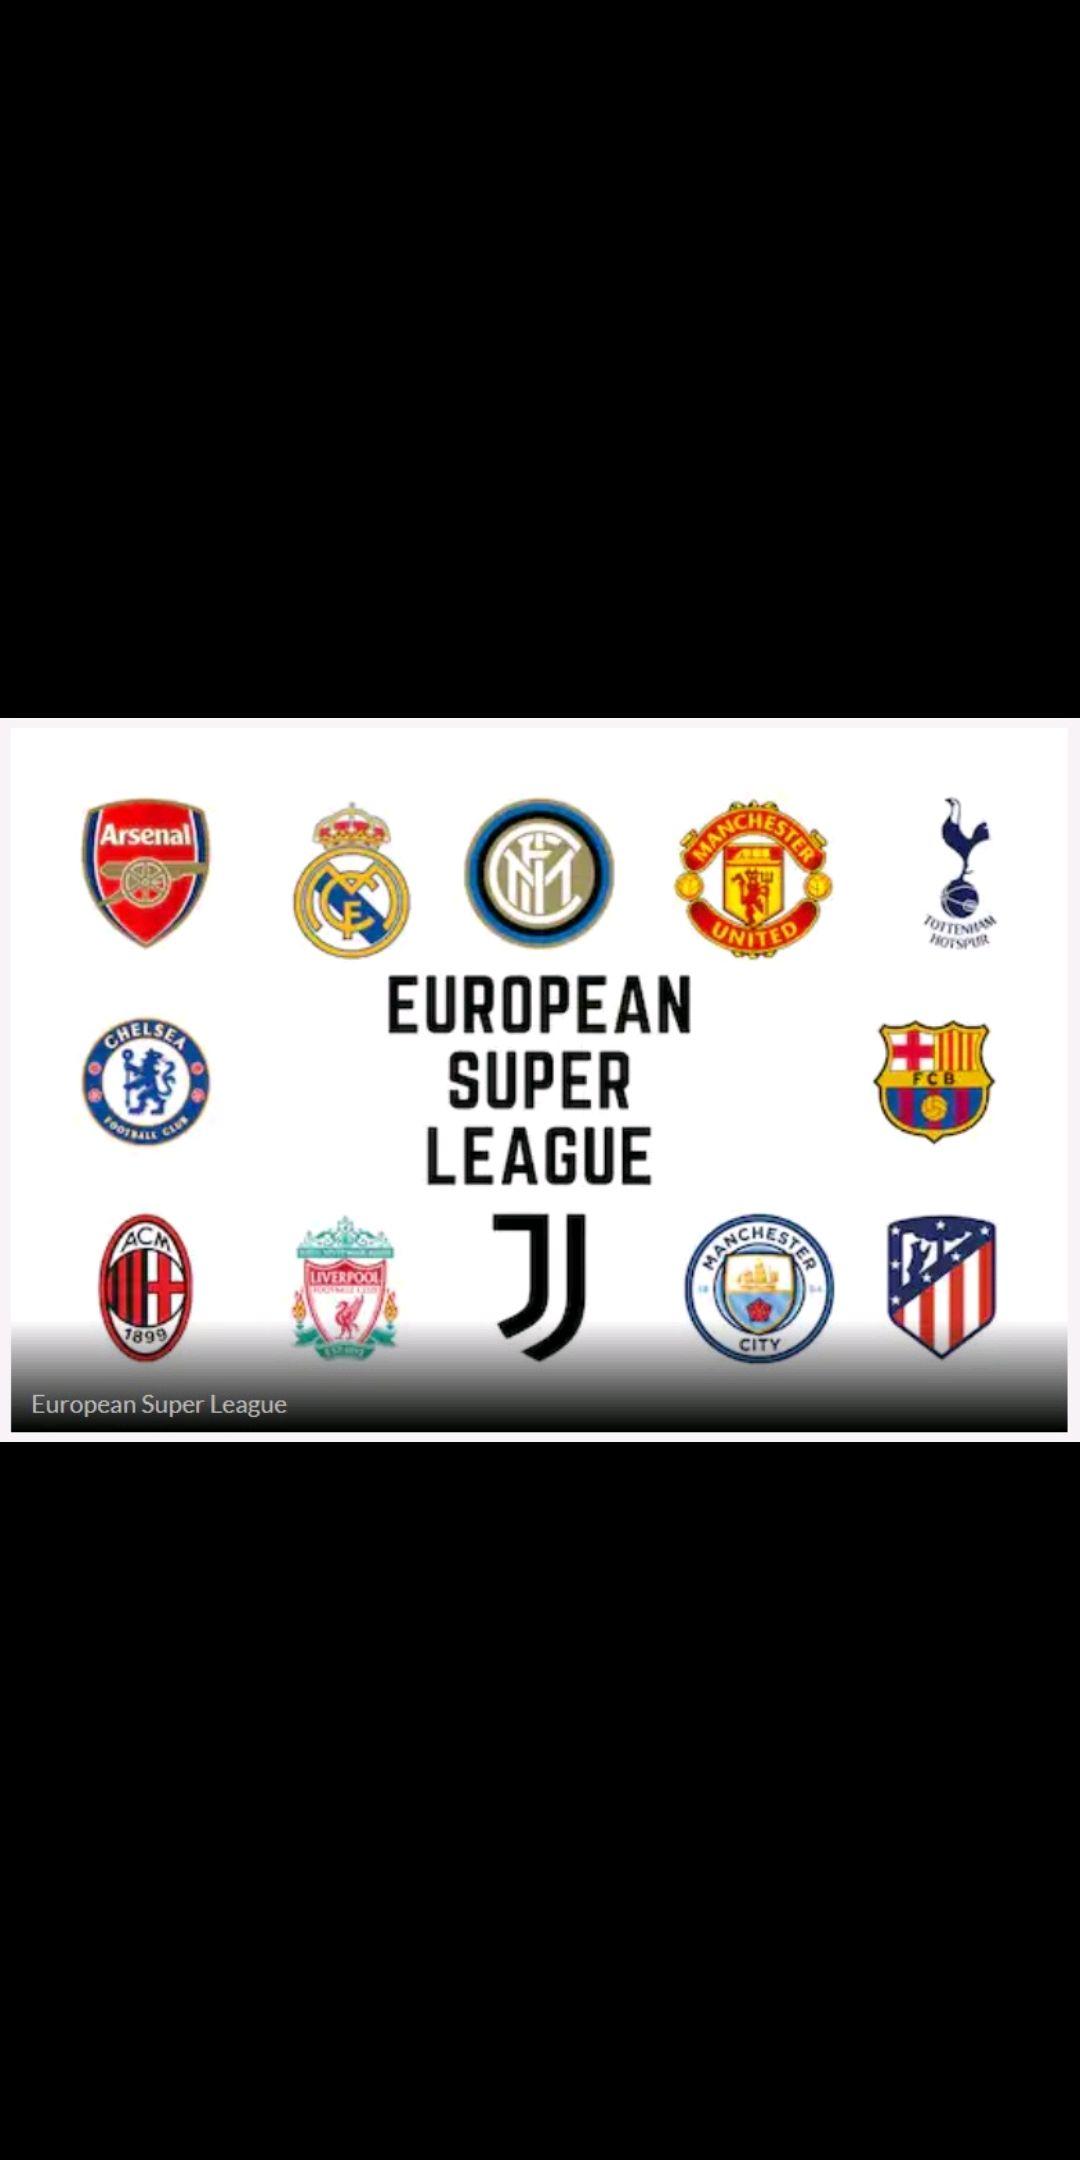 Uploaded by @Futbol